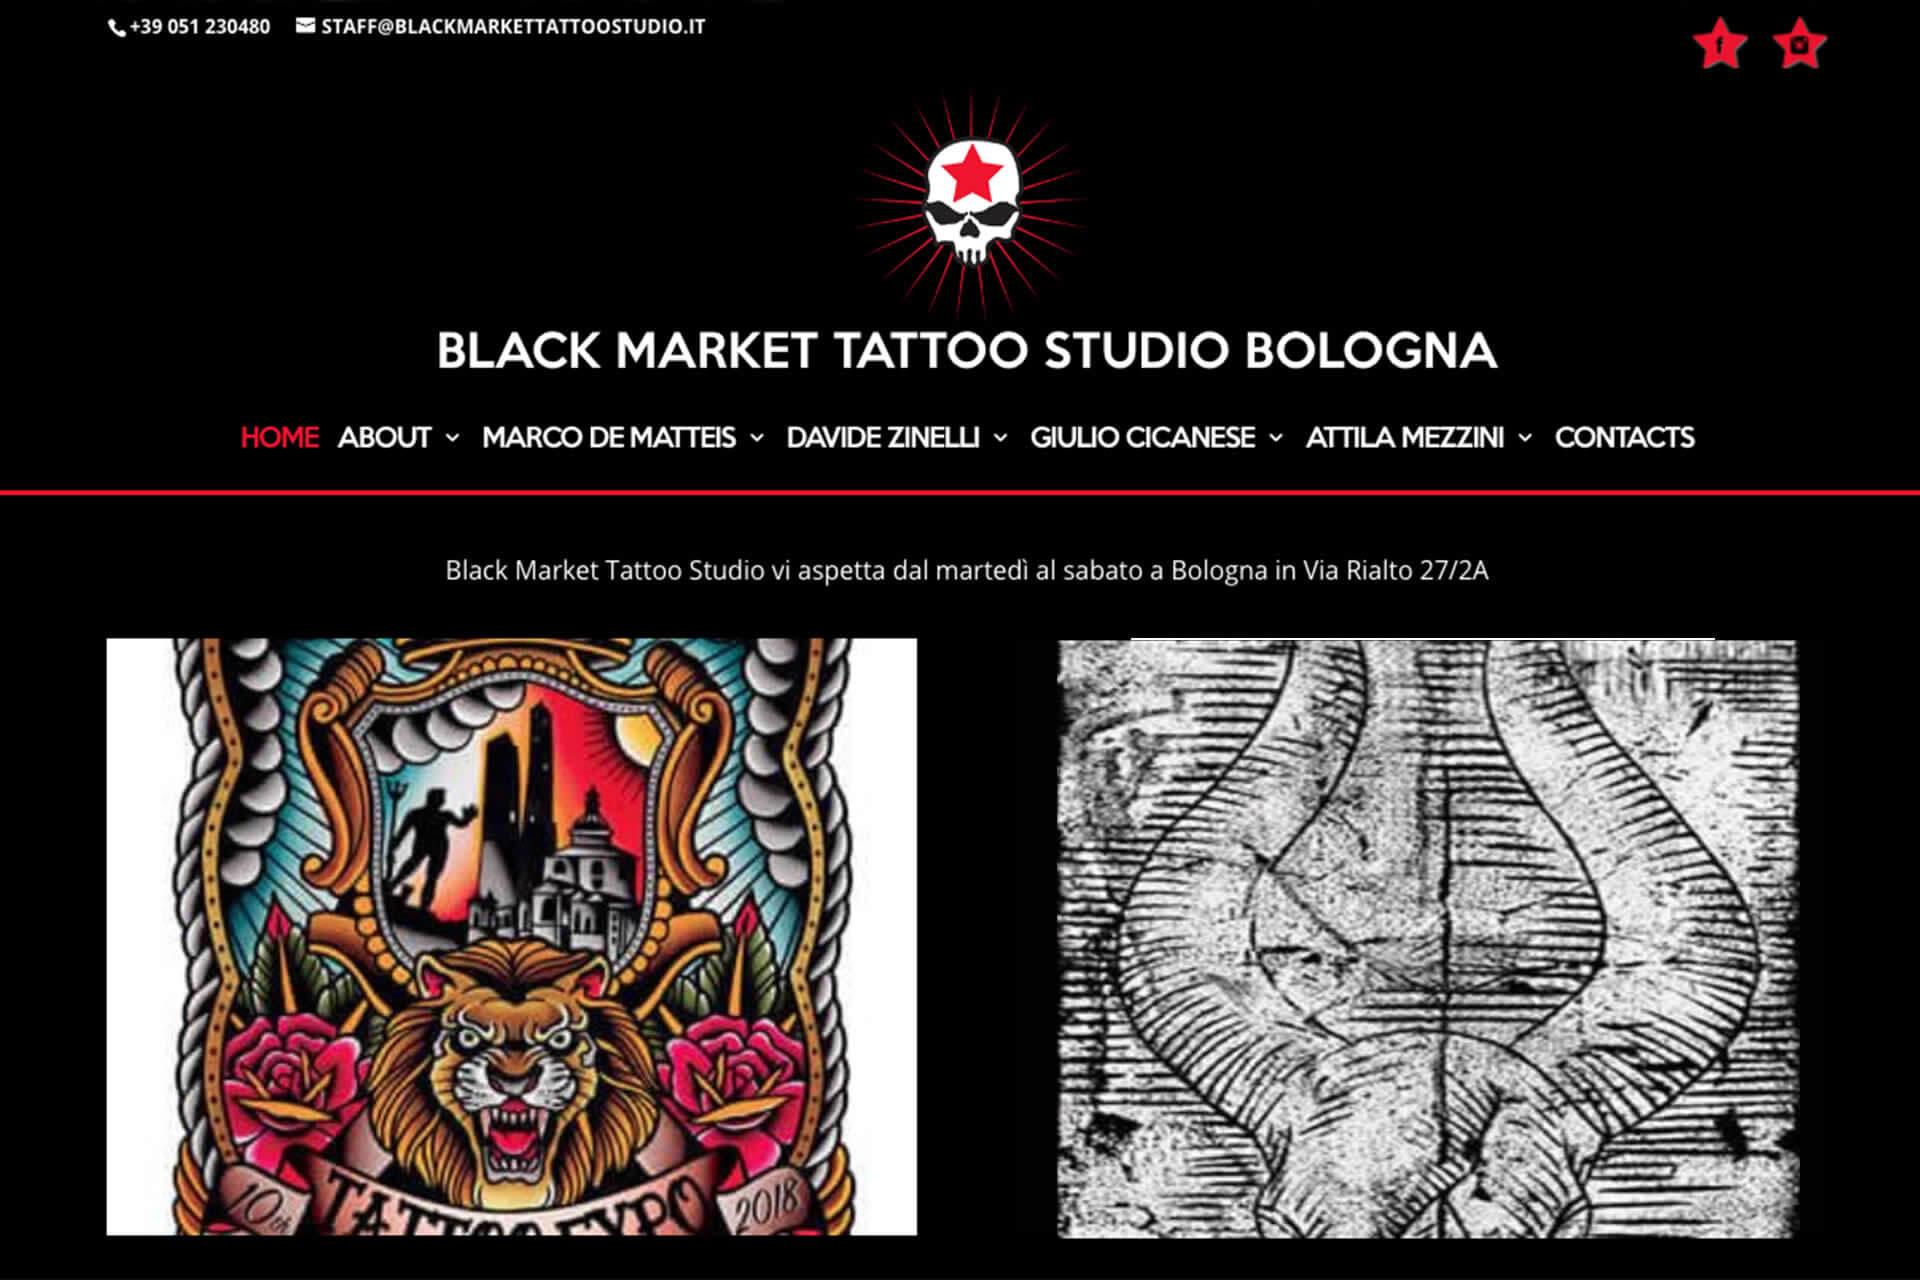 Black Market Tattoo Studio Sito Web